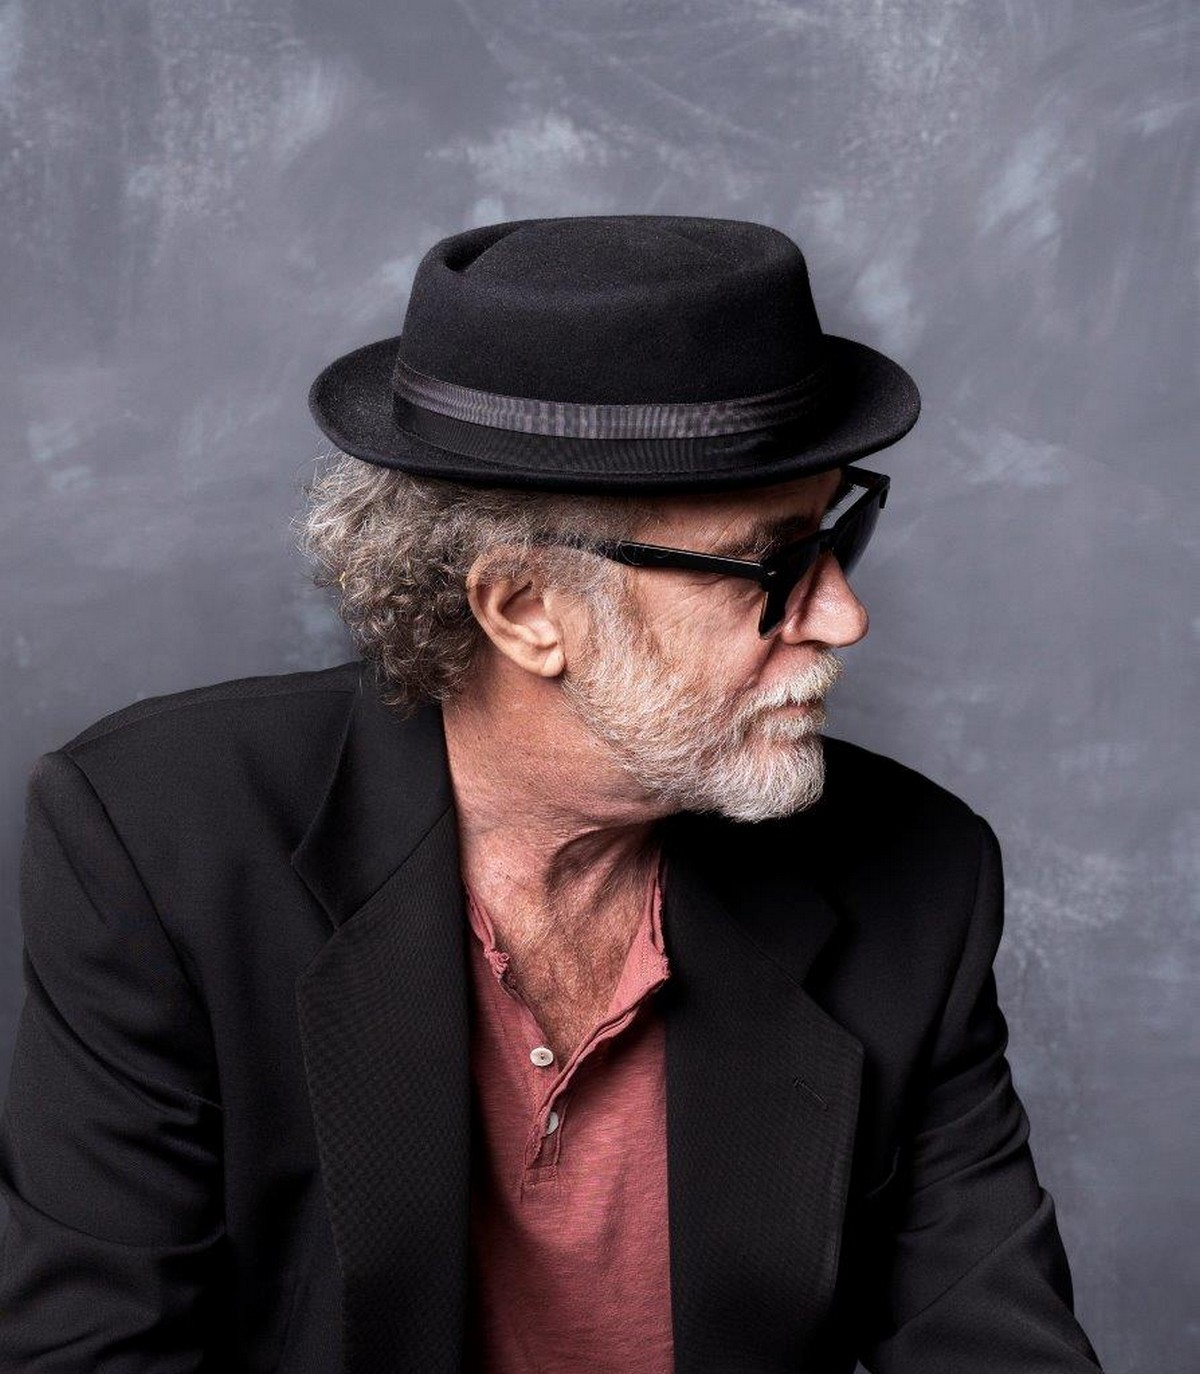 Francesco De Gregori foto di Daniele Barraco